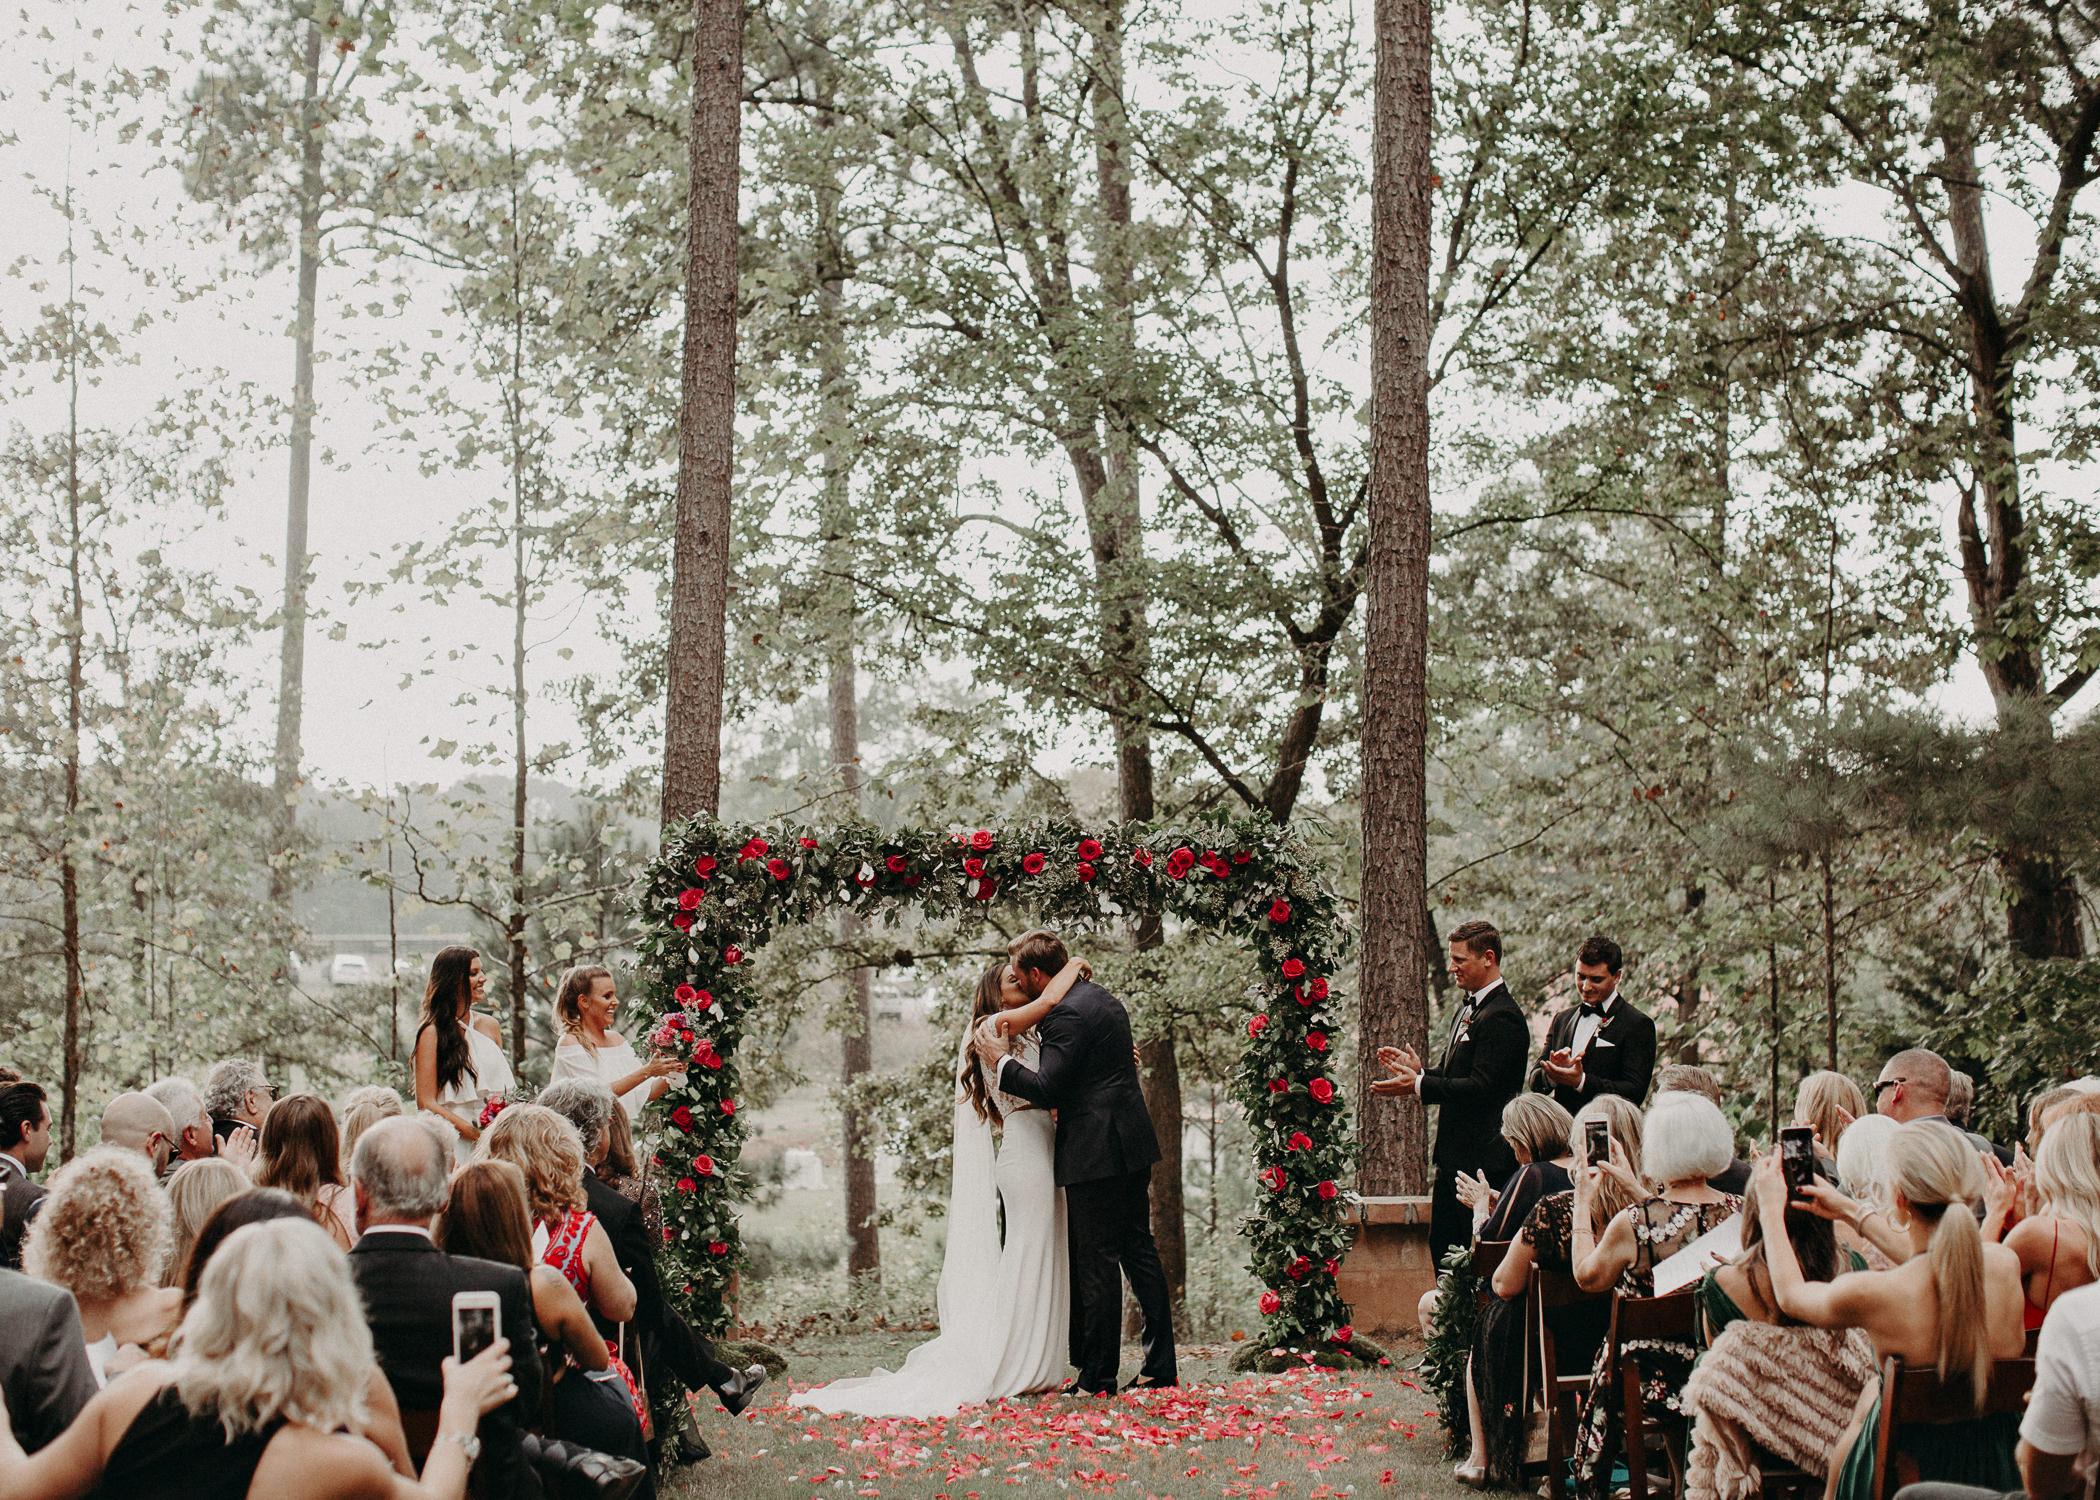 70 - Exchange of vows at wedding ceremony at serenbi farms atlanta .jpg